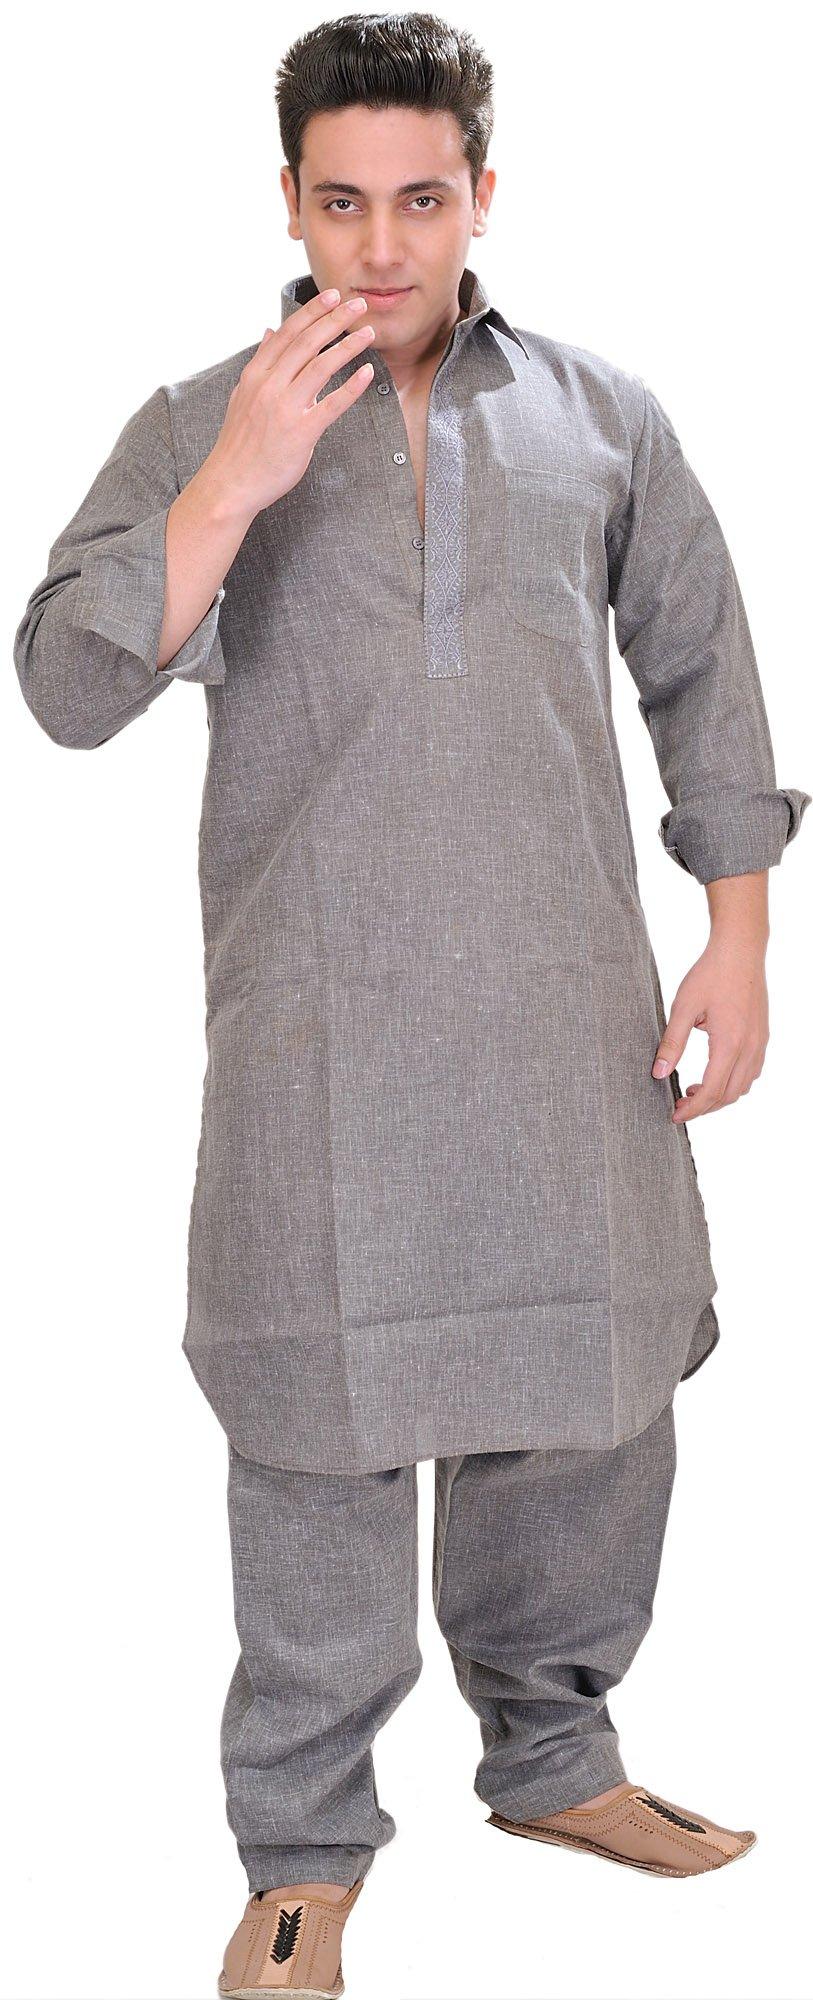 Exotic India Plain Pathani Kur - Color Excalibur Gray Size 44